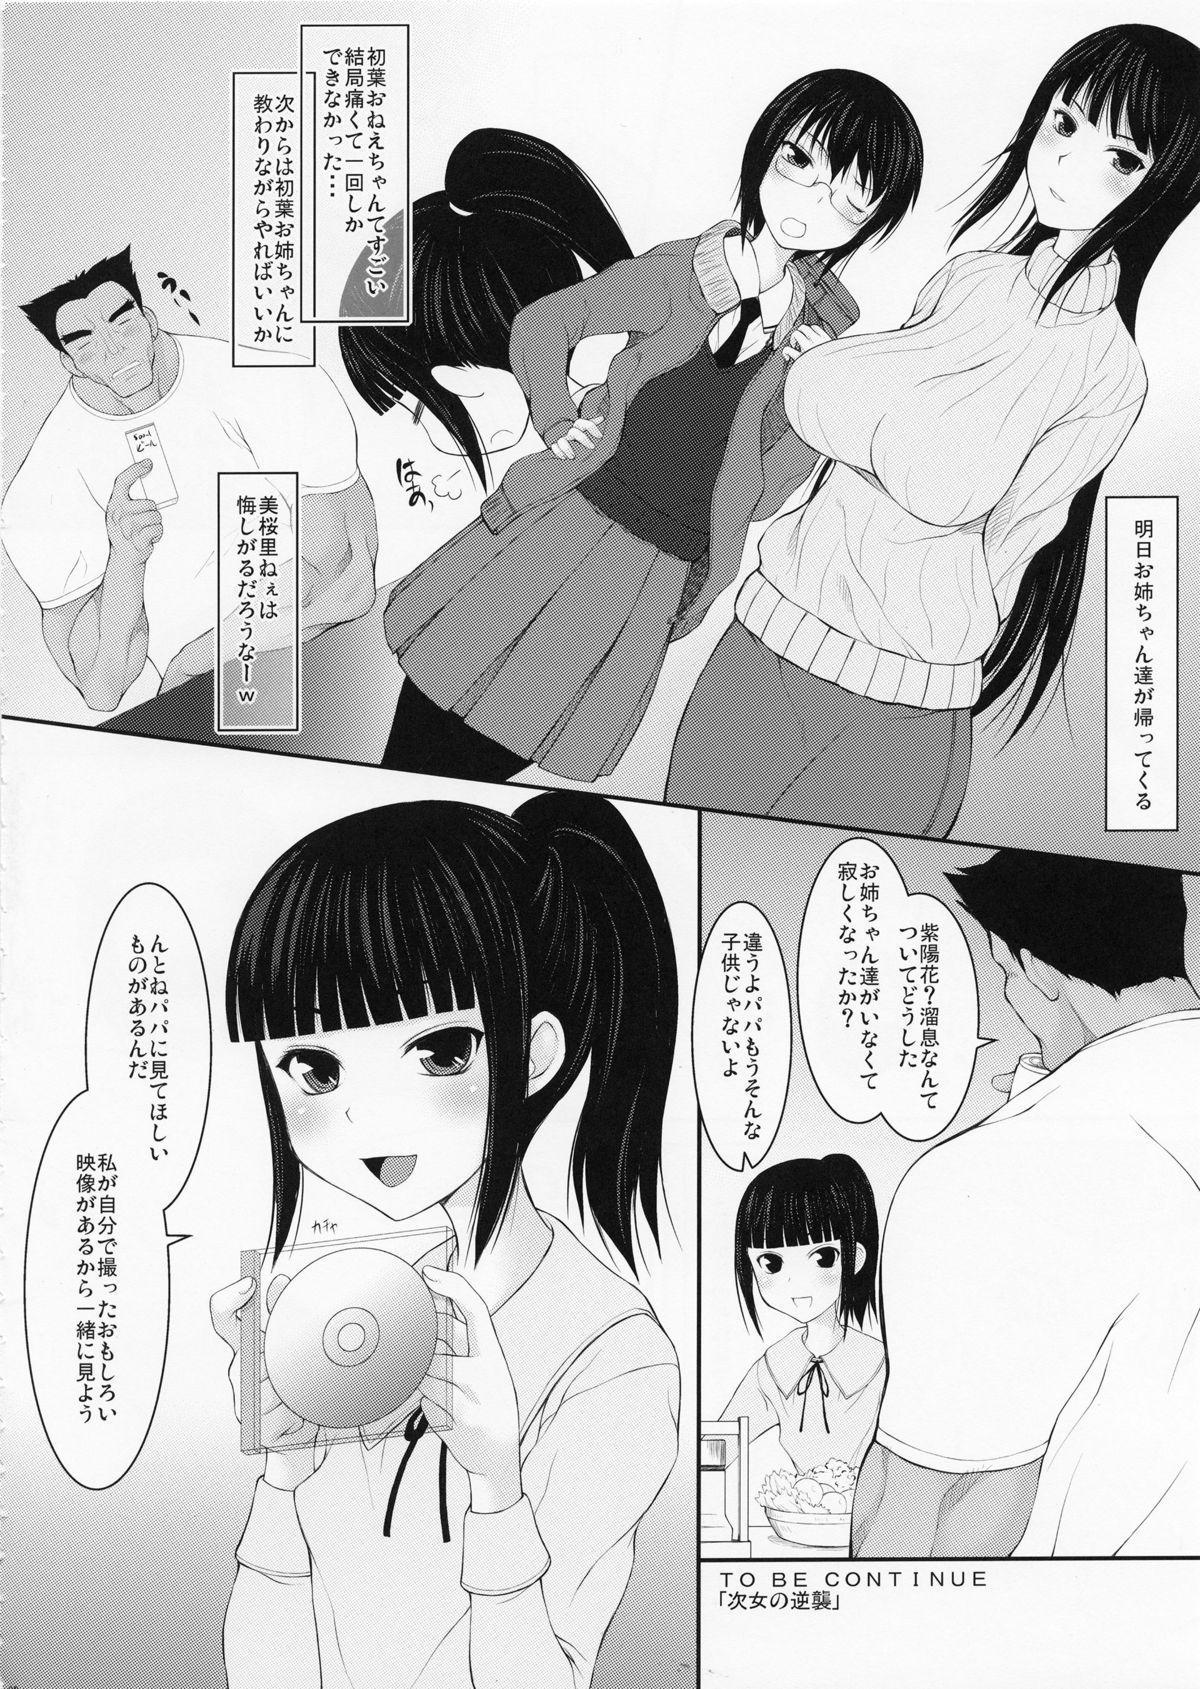 Oyako Suemusume Chichioya Kyoushuu Hen 18